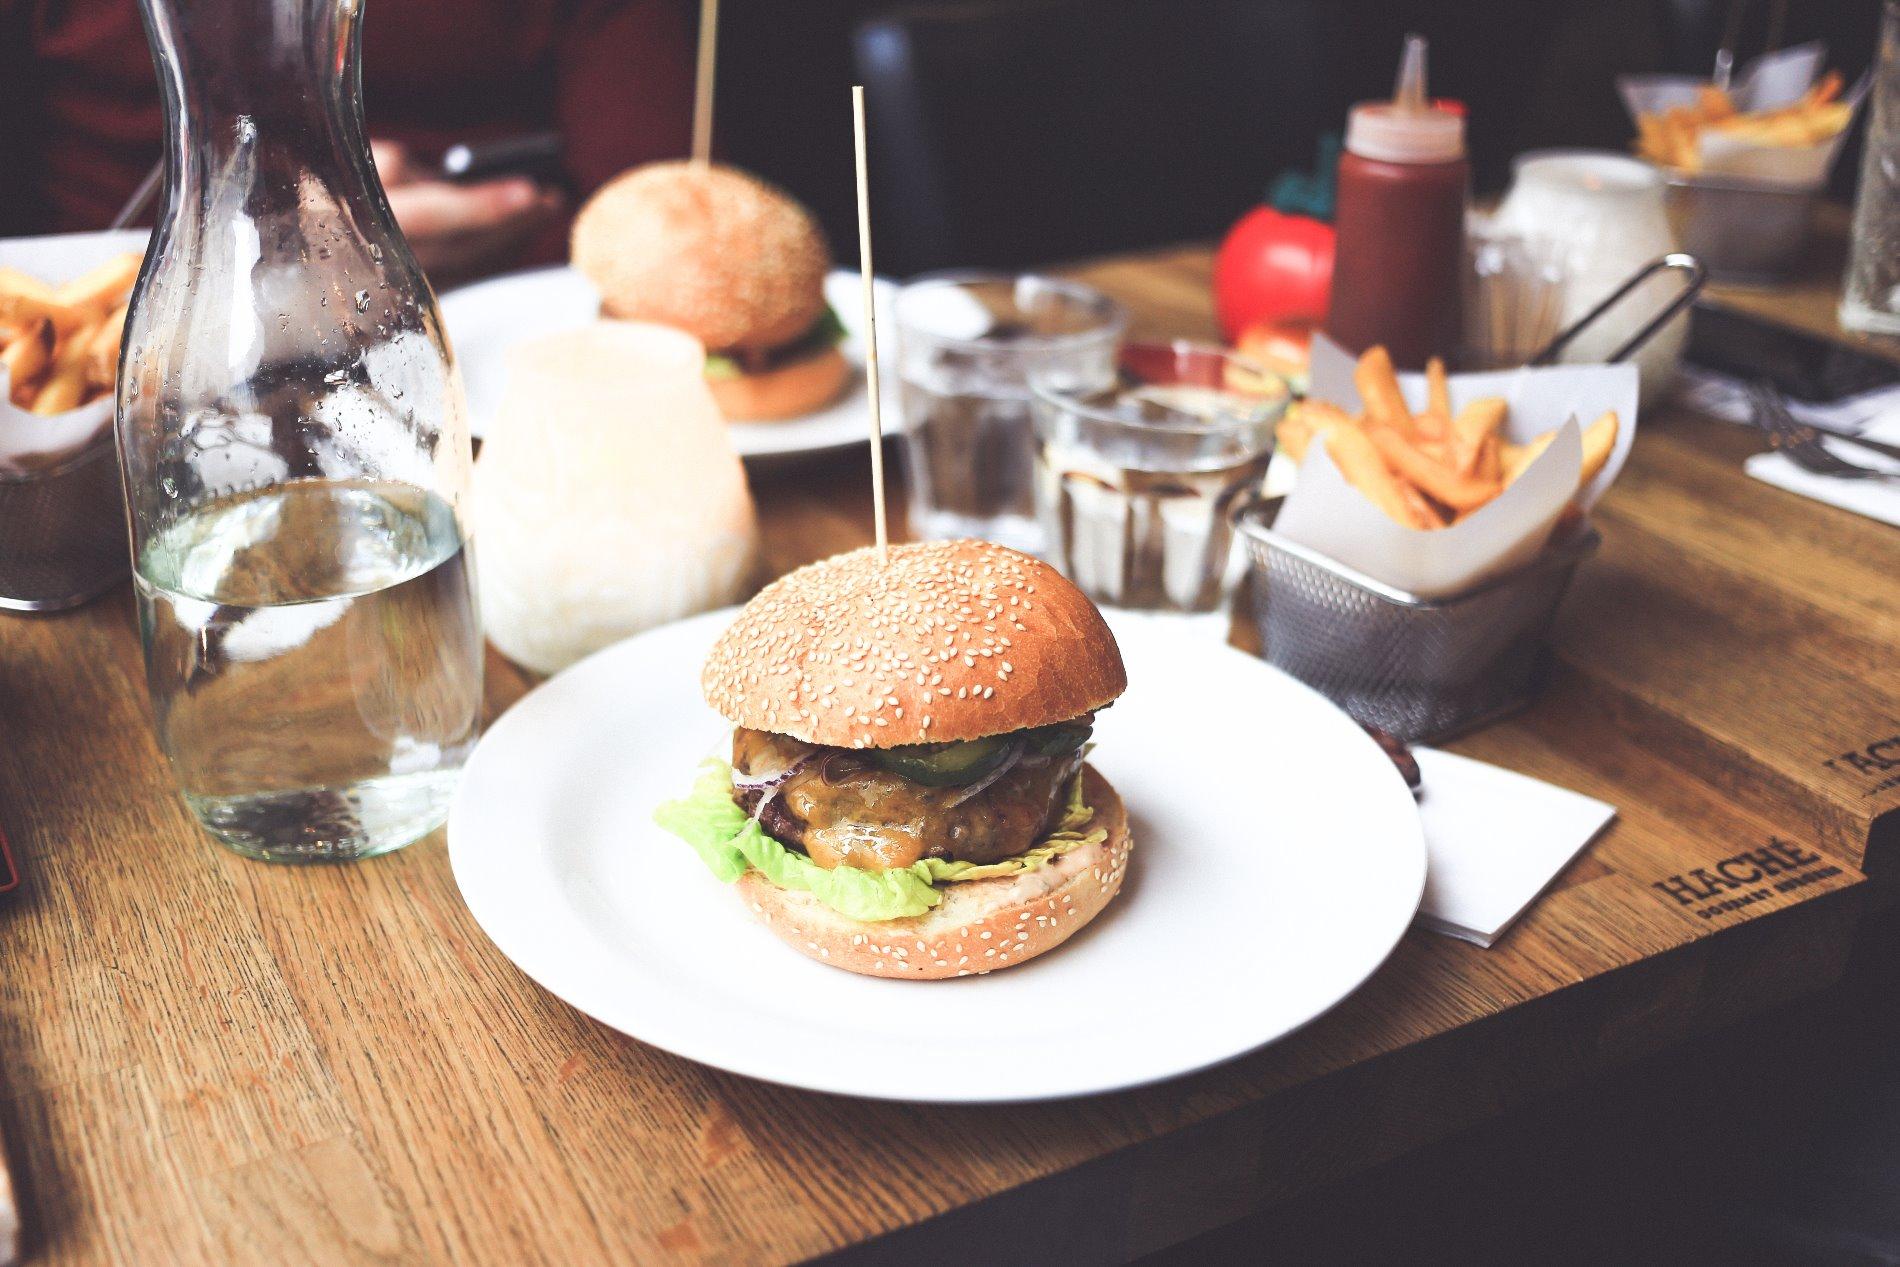 American Diner Burger Restaurant American Diner Restaurant - Our History 7